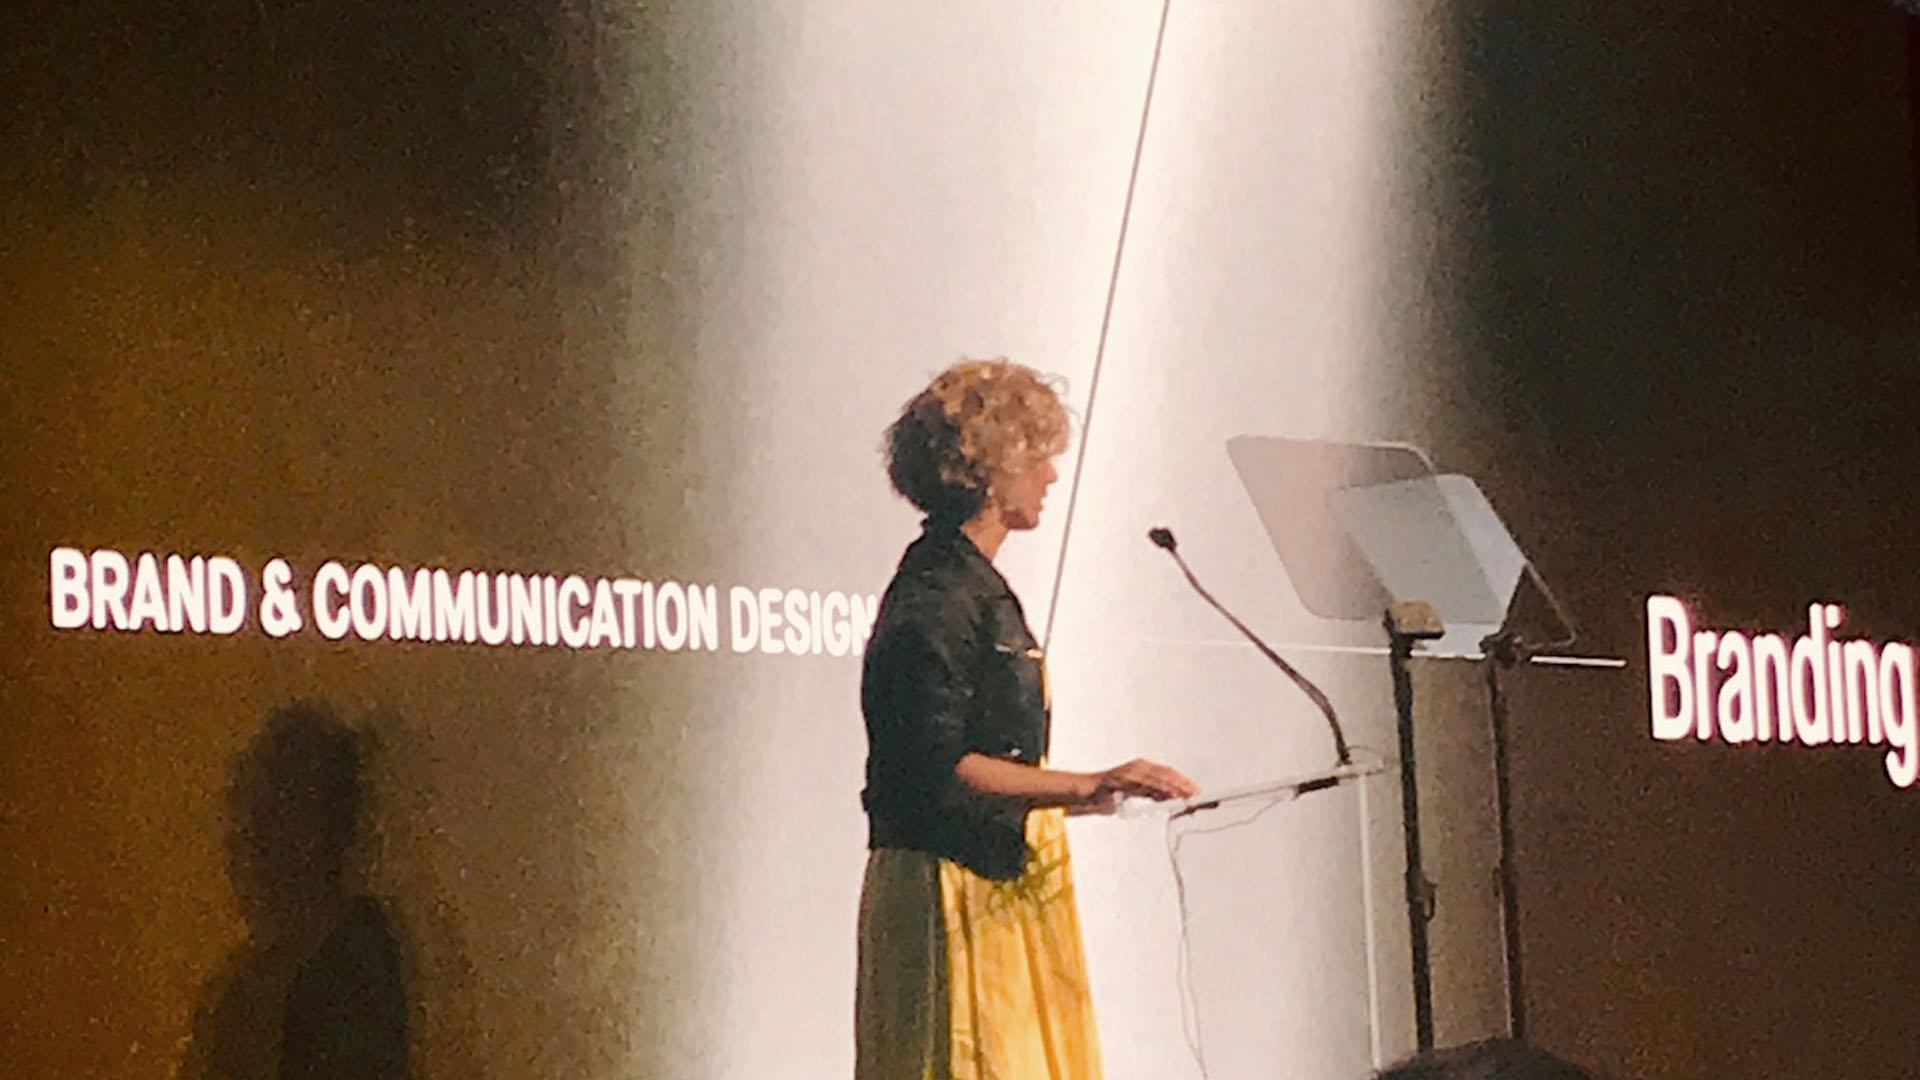 Awards DAY CREATIVE Red dot award Brand & Communication design awards